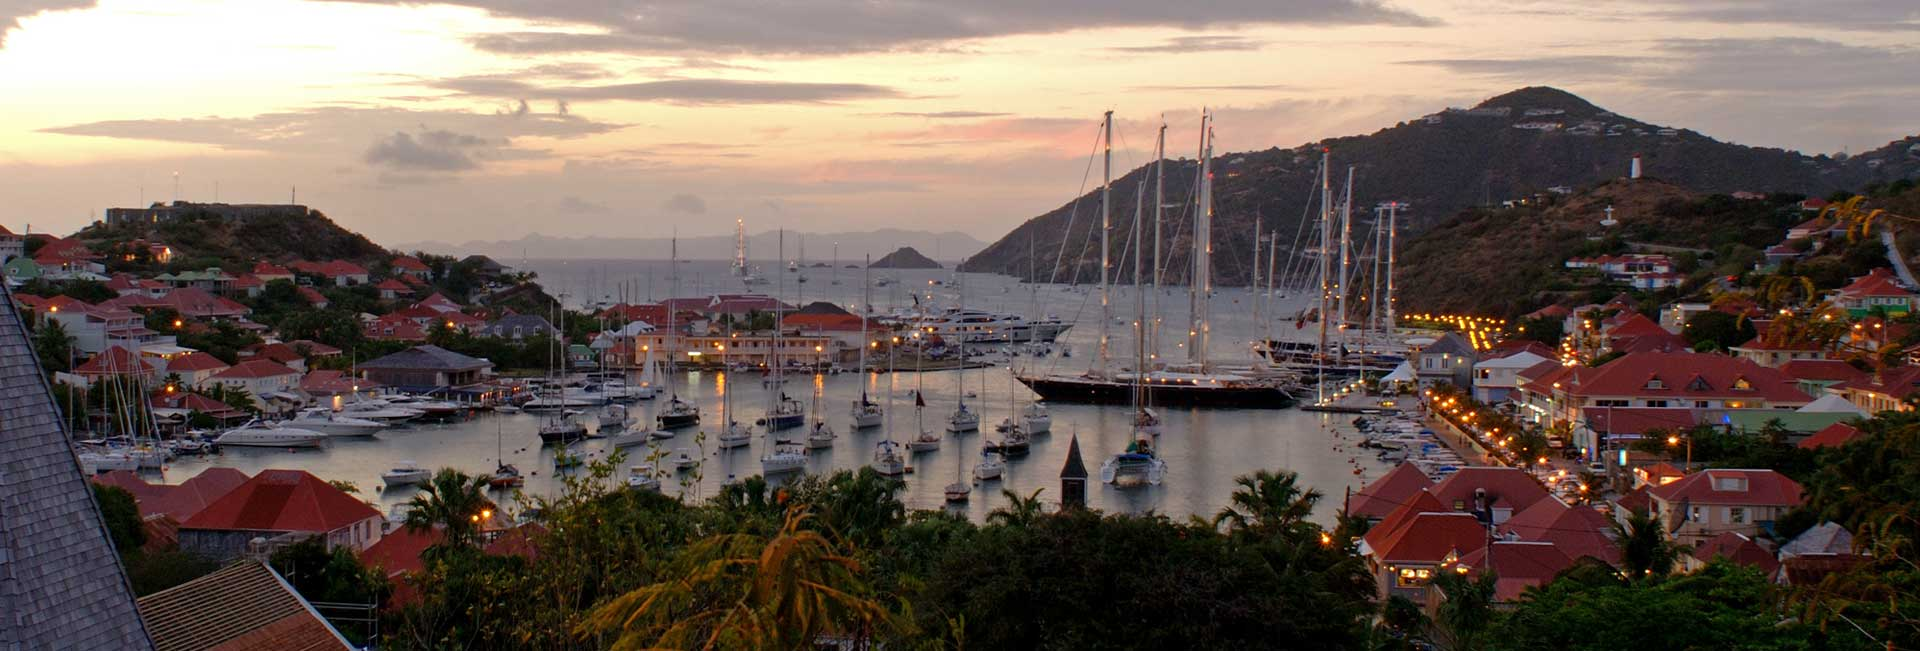 Jean-Philippe Piter : port de Gustavia - Saint-Barthélémy